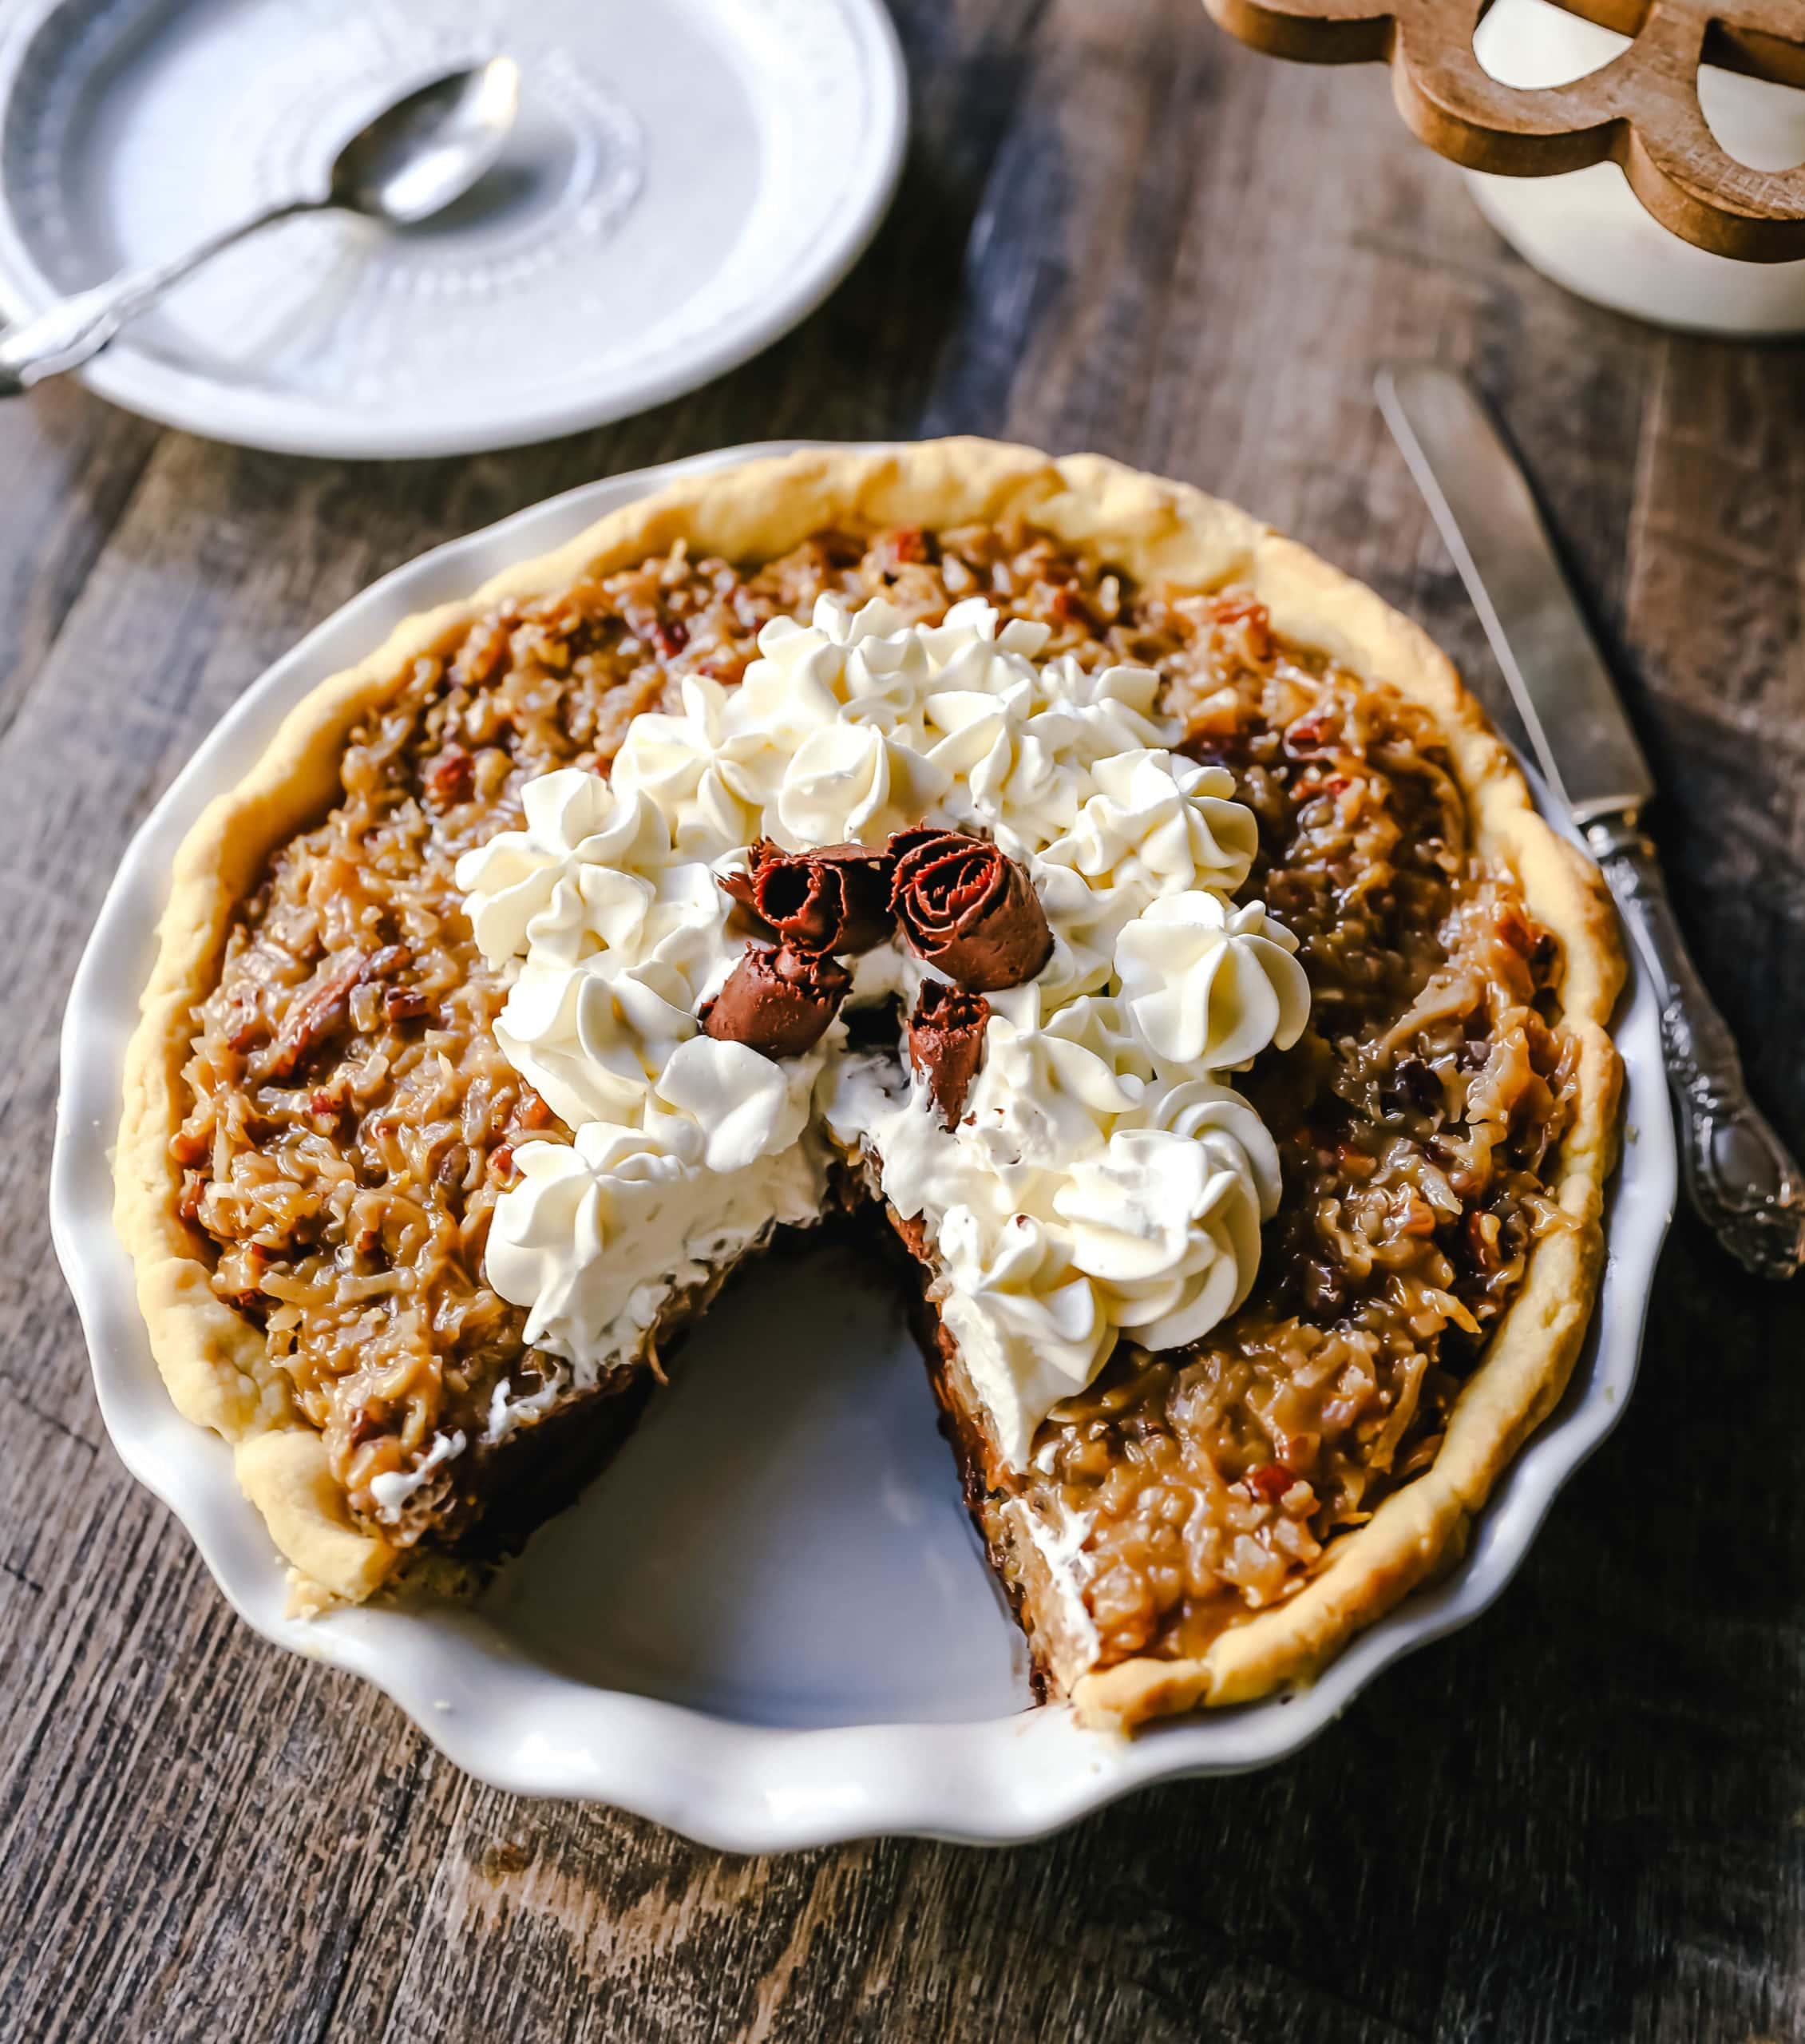 German Chocolate Pie. Creamy rich chocolate pie with a sticky German chocolate coconut-pecan topping and fresh whipped cream and chocolate shavings.www.modernhoney.com #pie #chocolatepie #germanchocolate